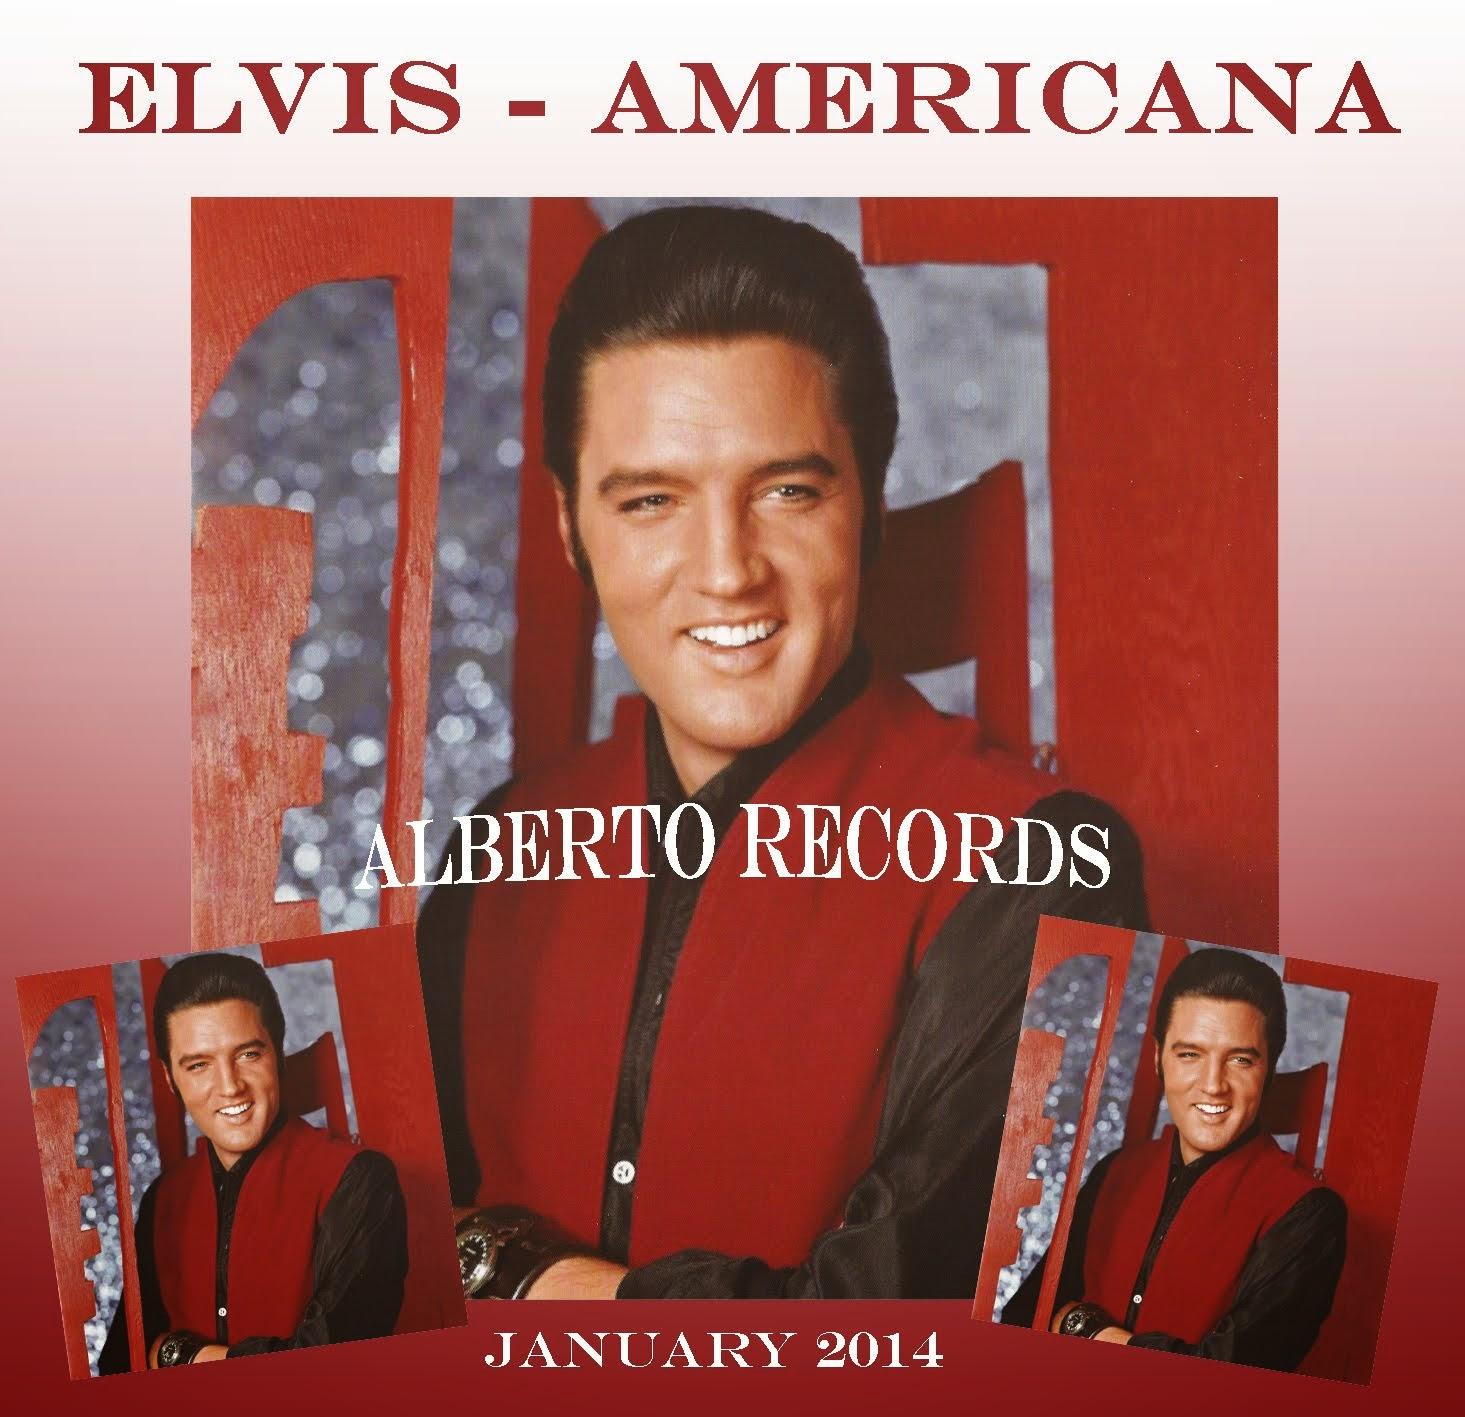 Elvis - Americana (January 2014)